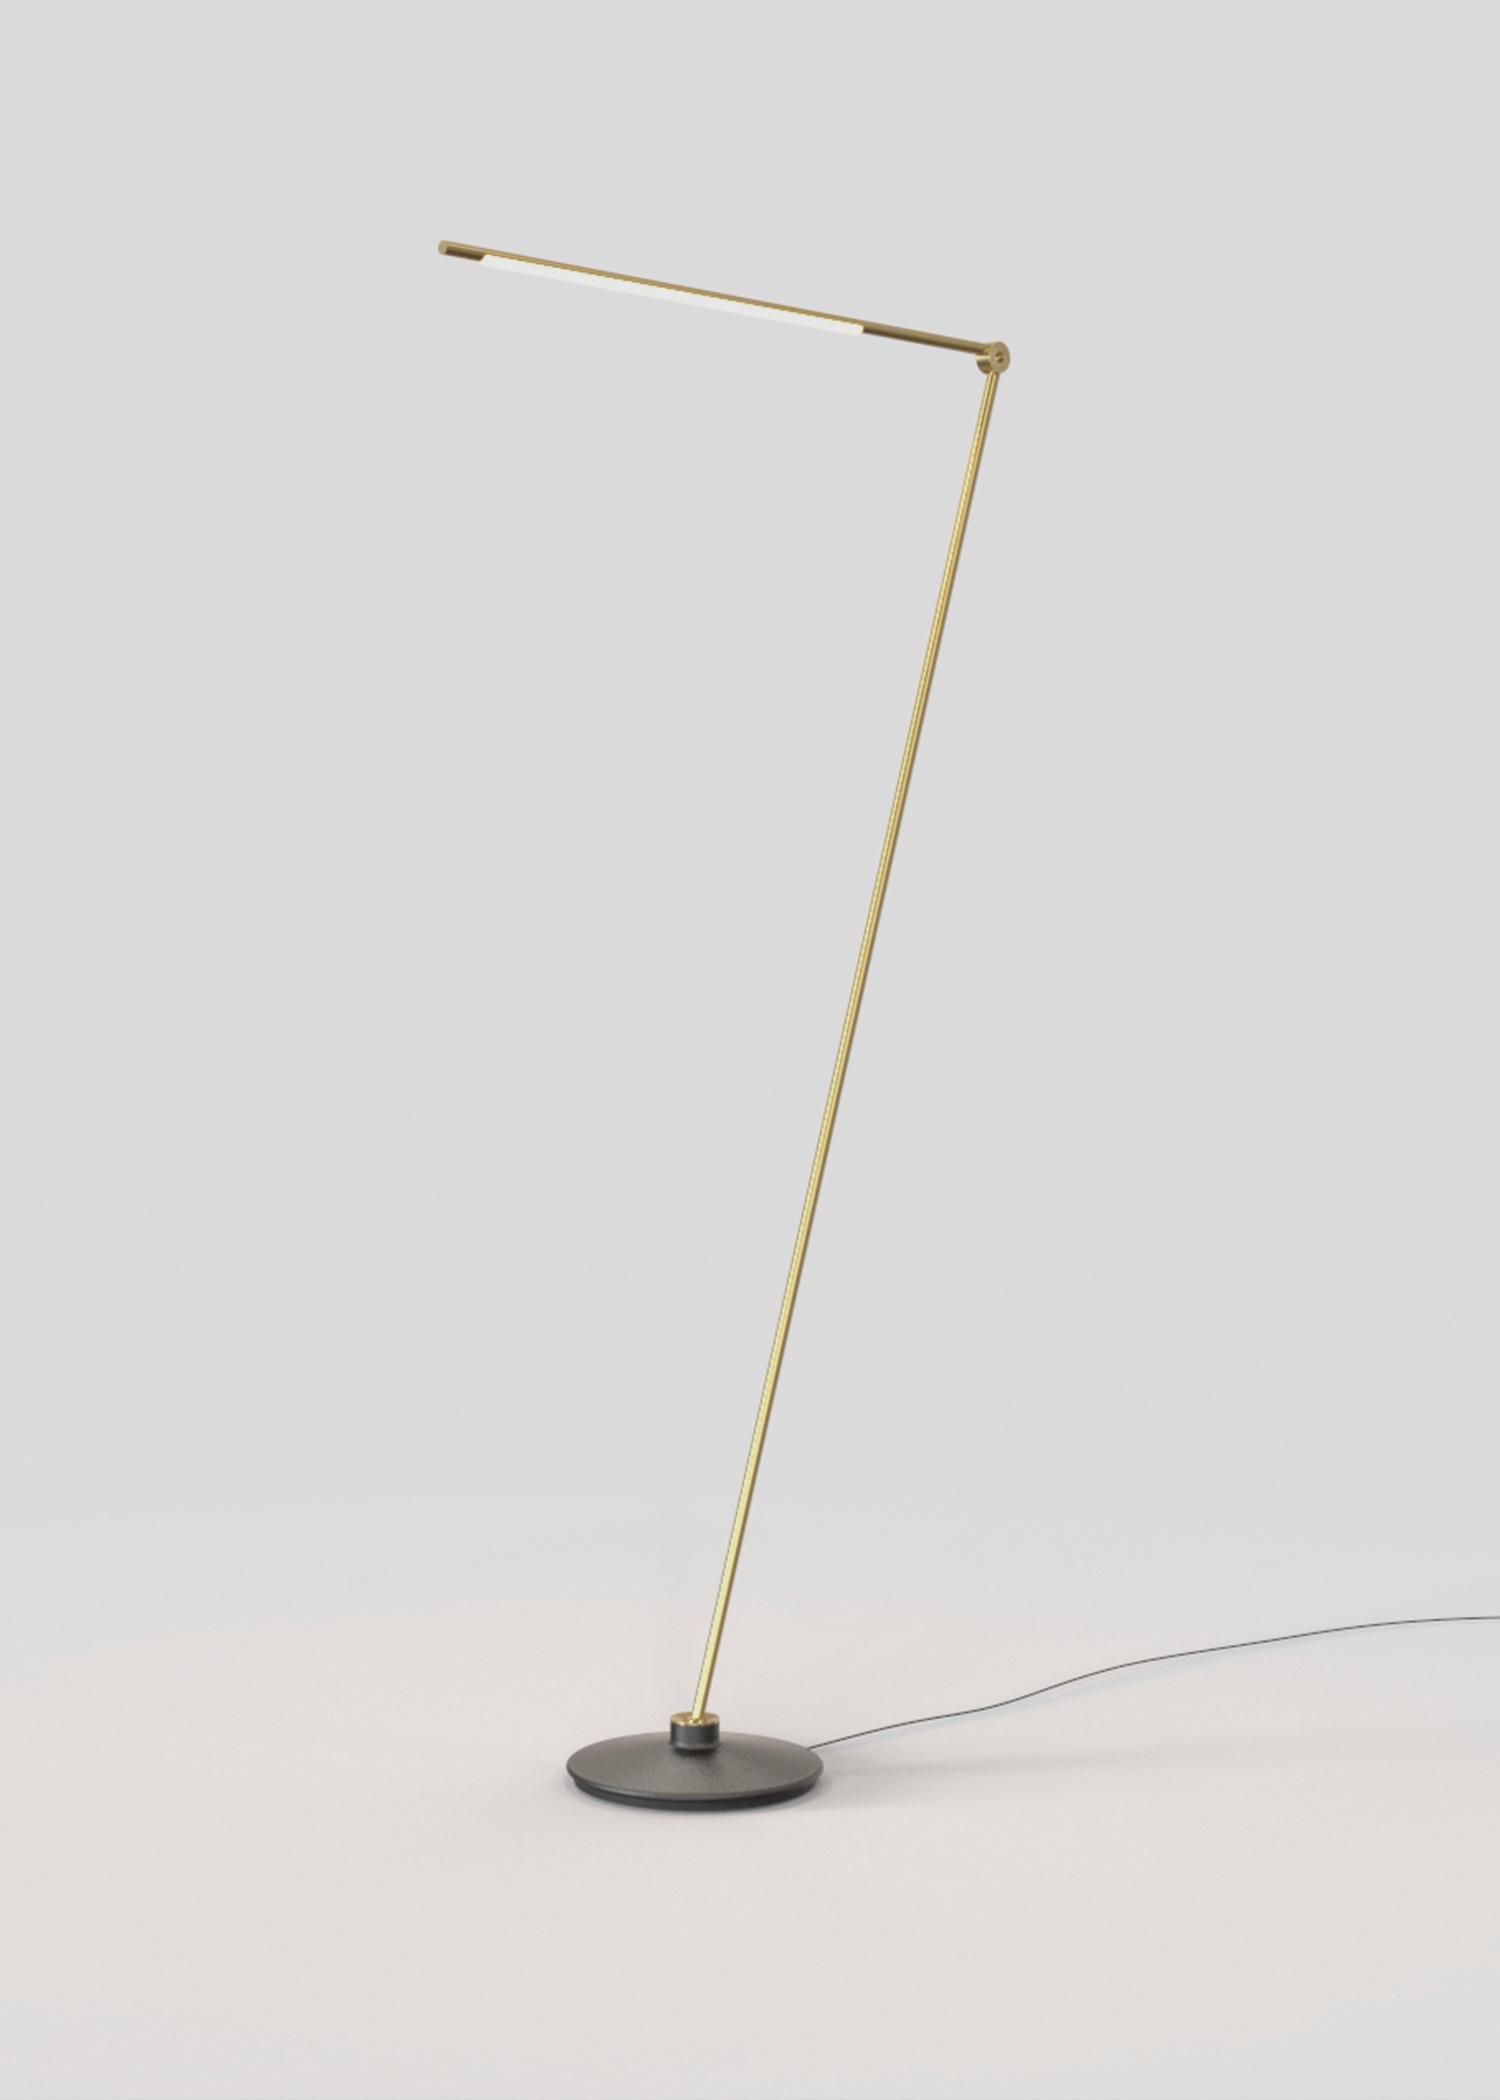 Elementi-Juniper-Floor-Lamp-1.jpg